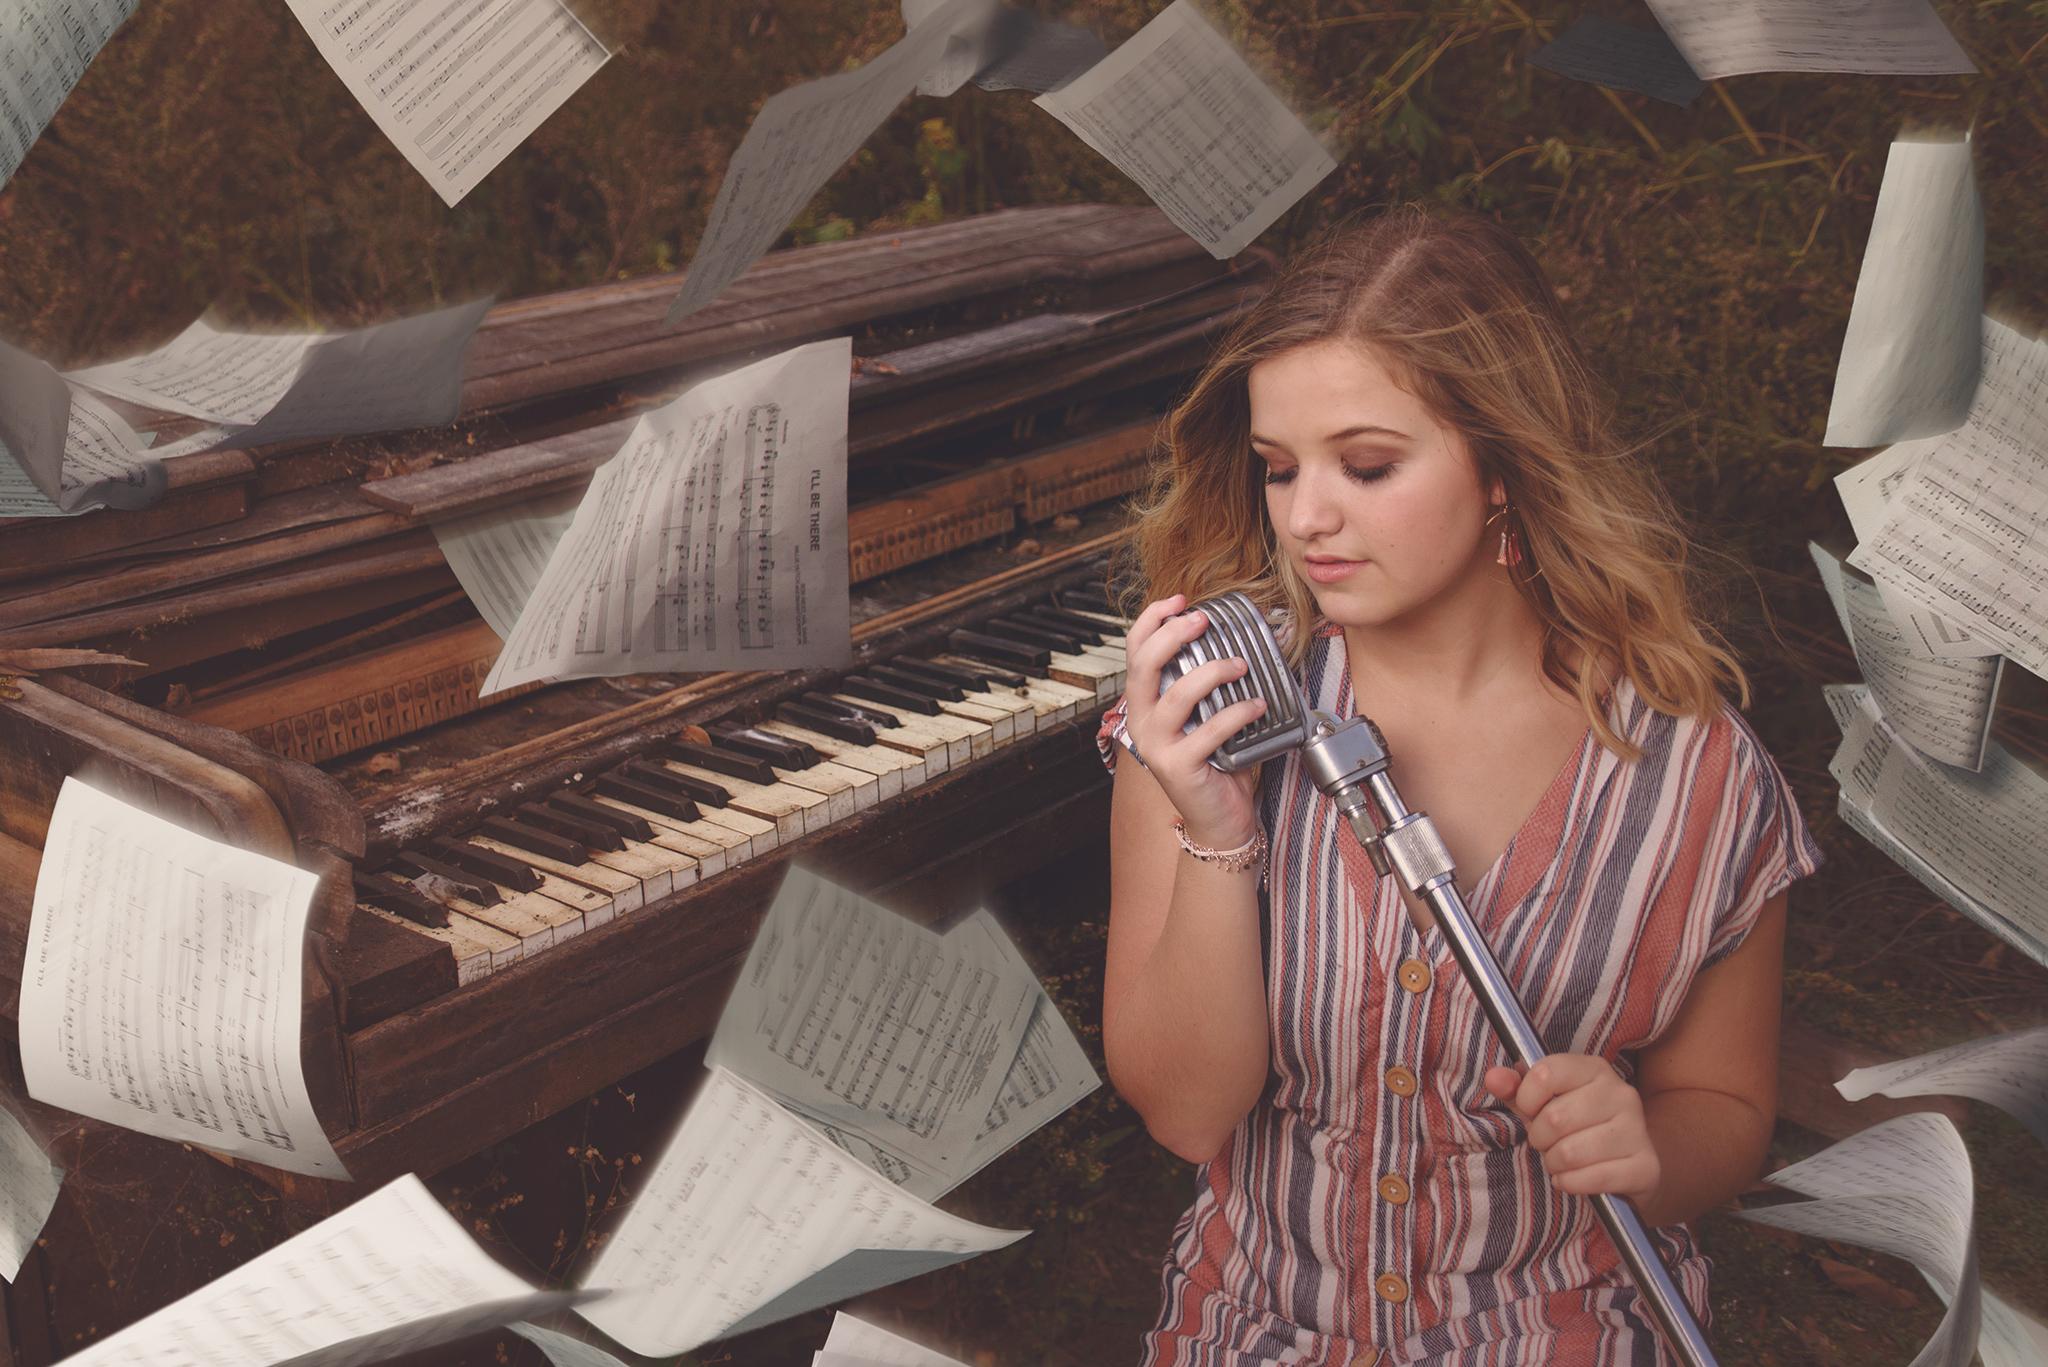 z Kennedy Sheet music cropped copy.jpg